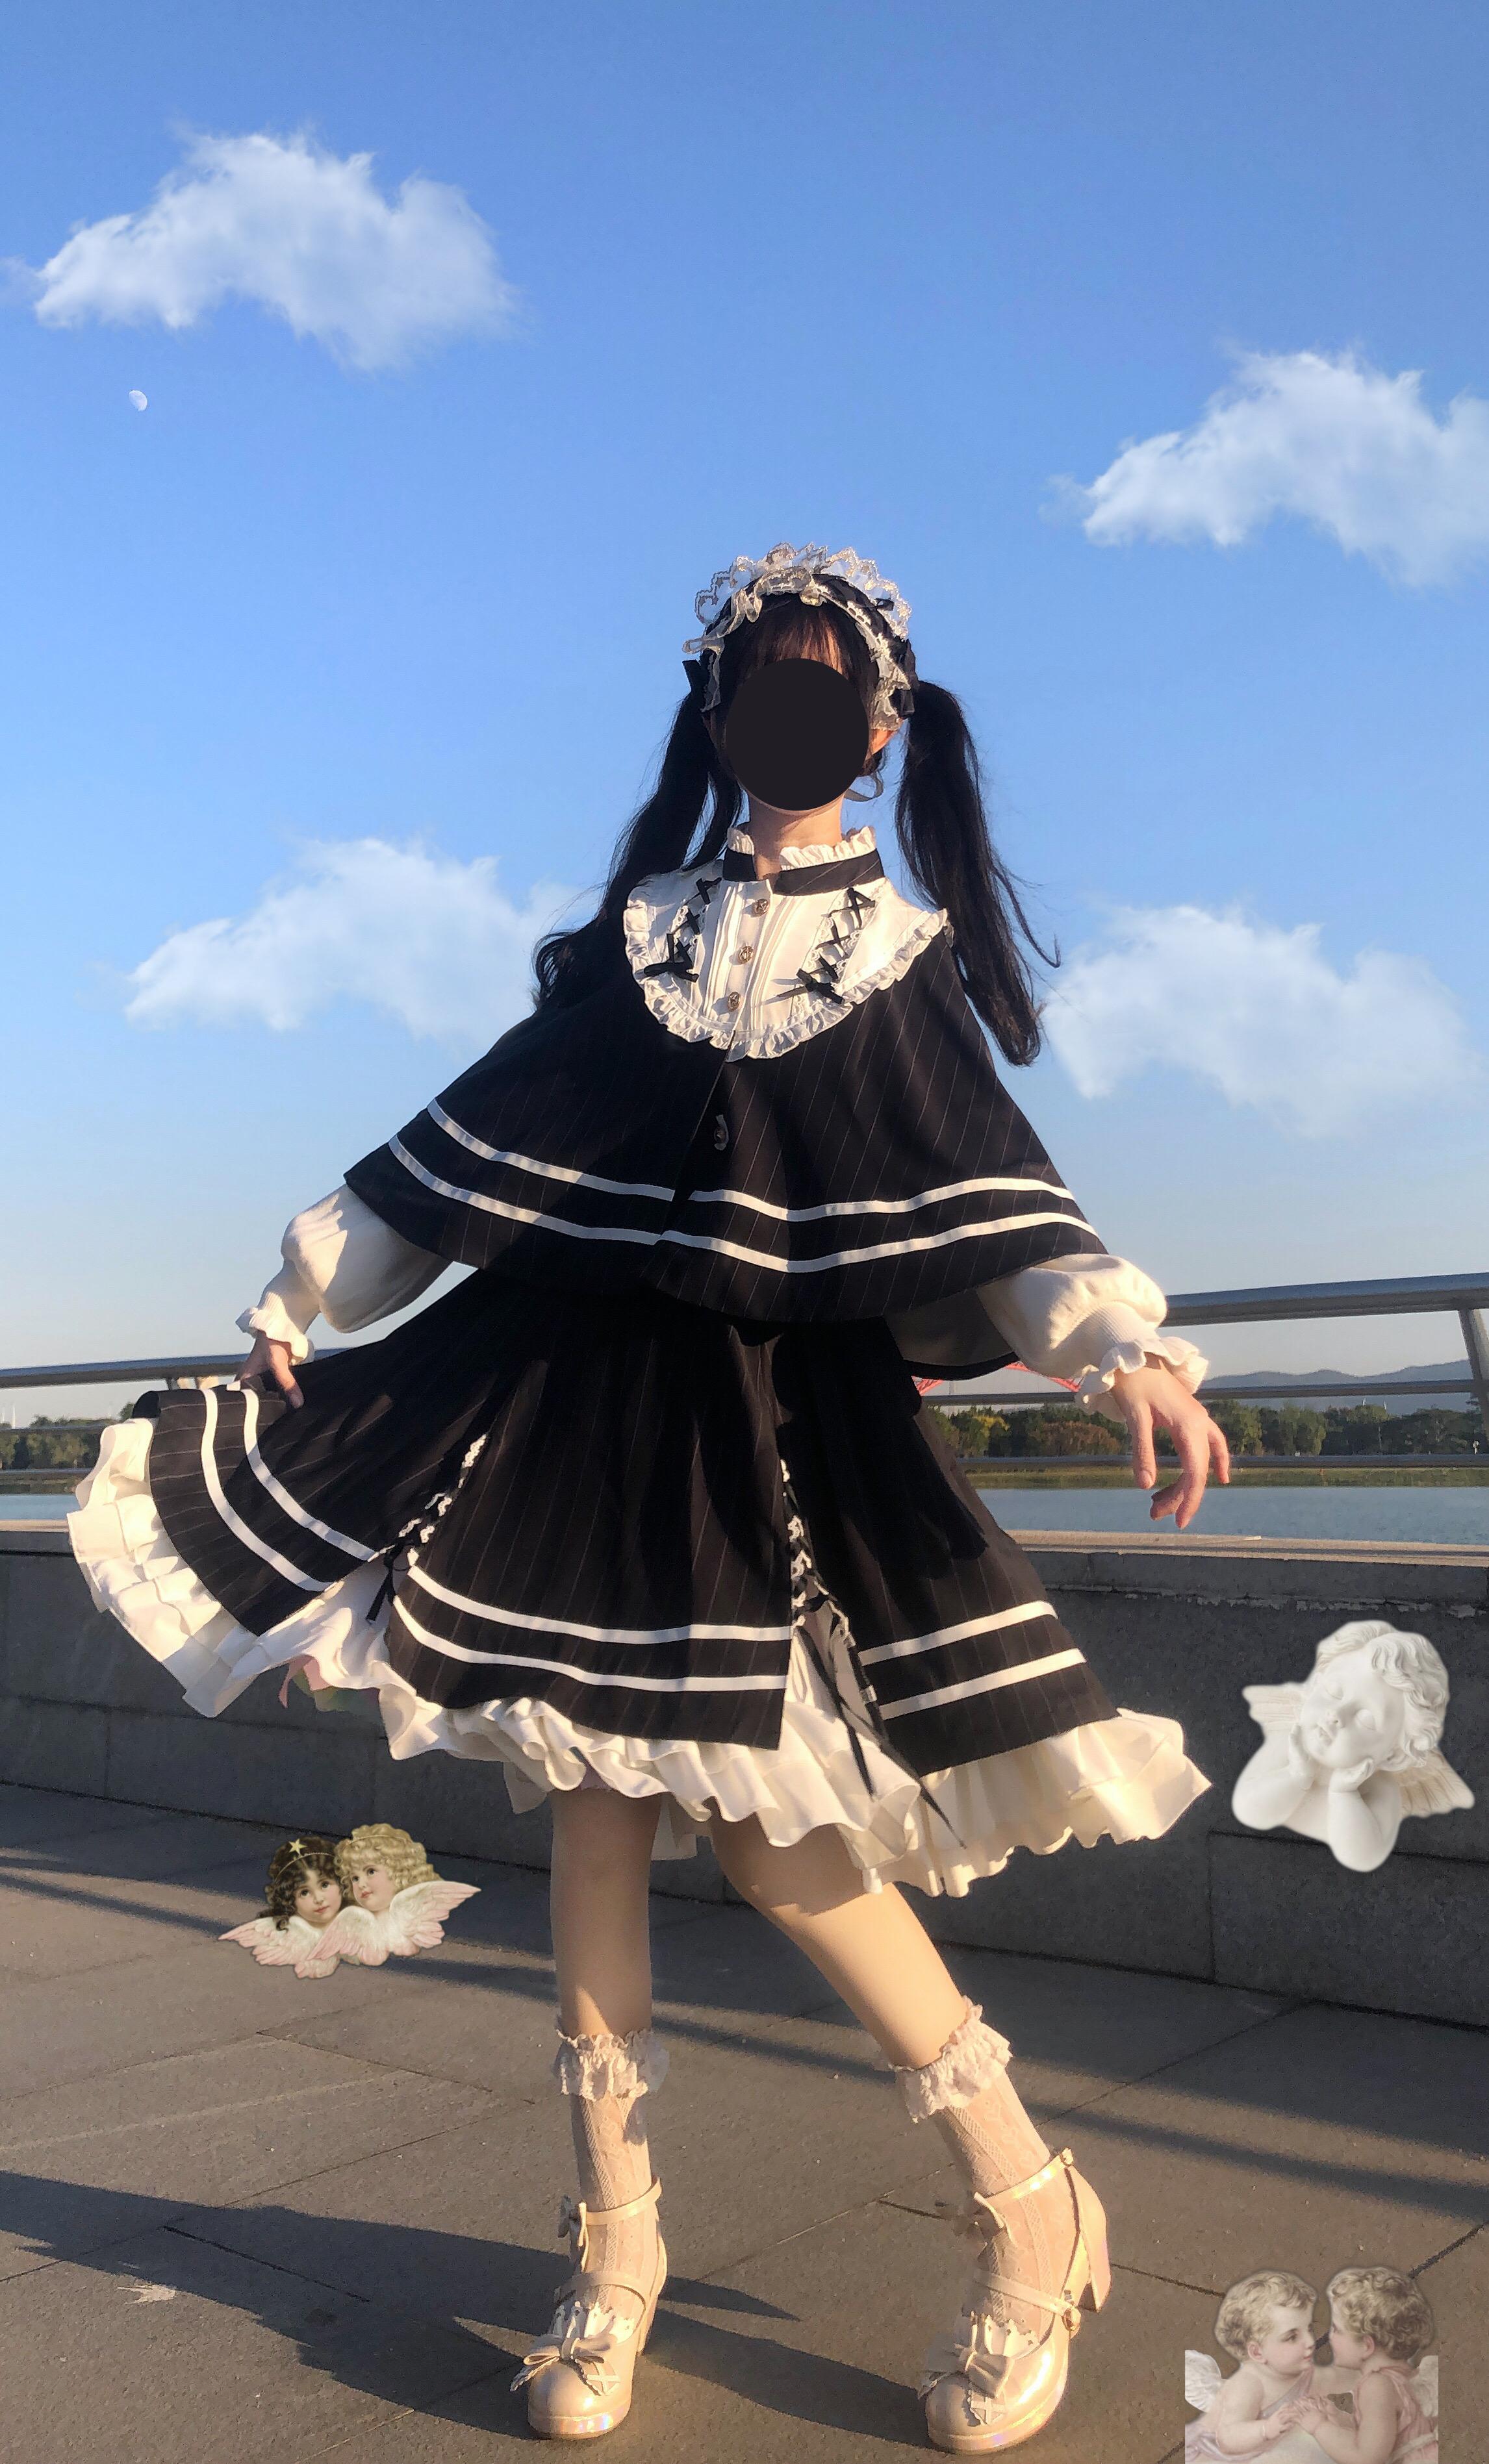 Spot top student Lolita Carol melody original British style Cape skirt two piece set authentic Lolita